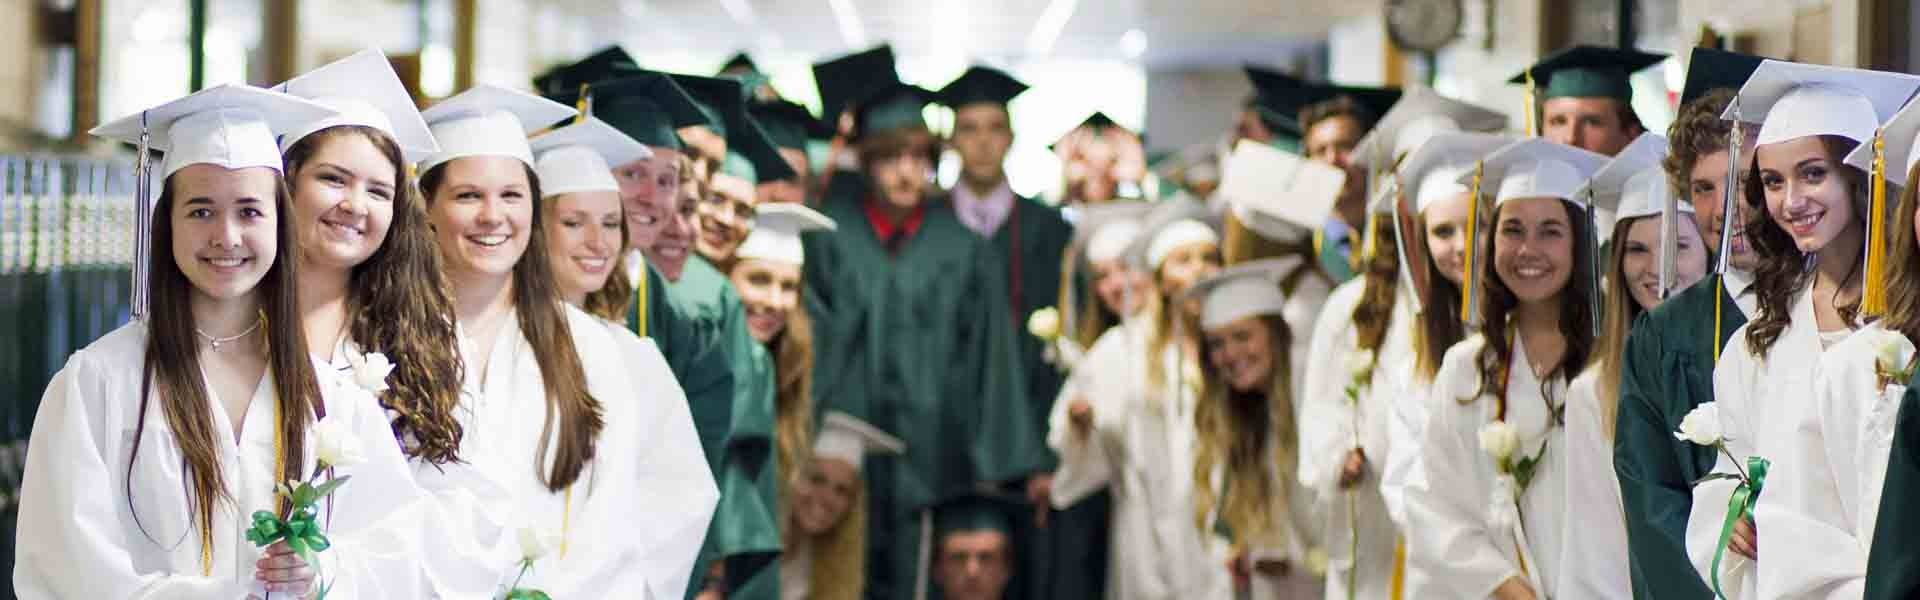 West Catholic Michigan USA Graduation Banner 2019